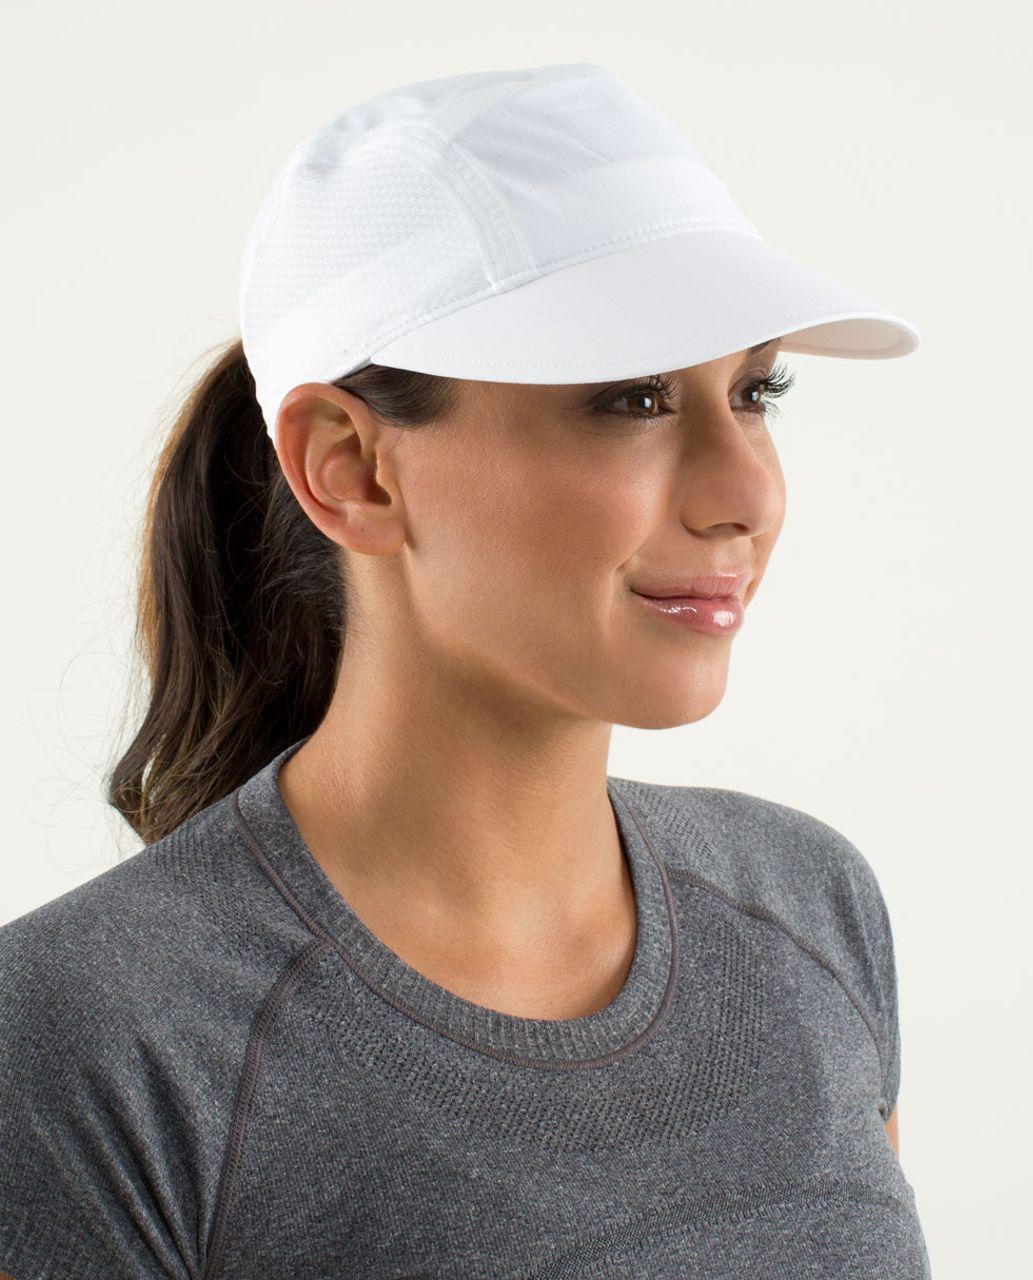 Lululemon Sun Chaser Run Hat - White (First Release)